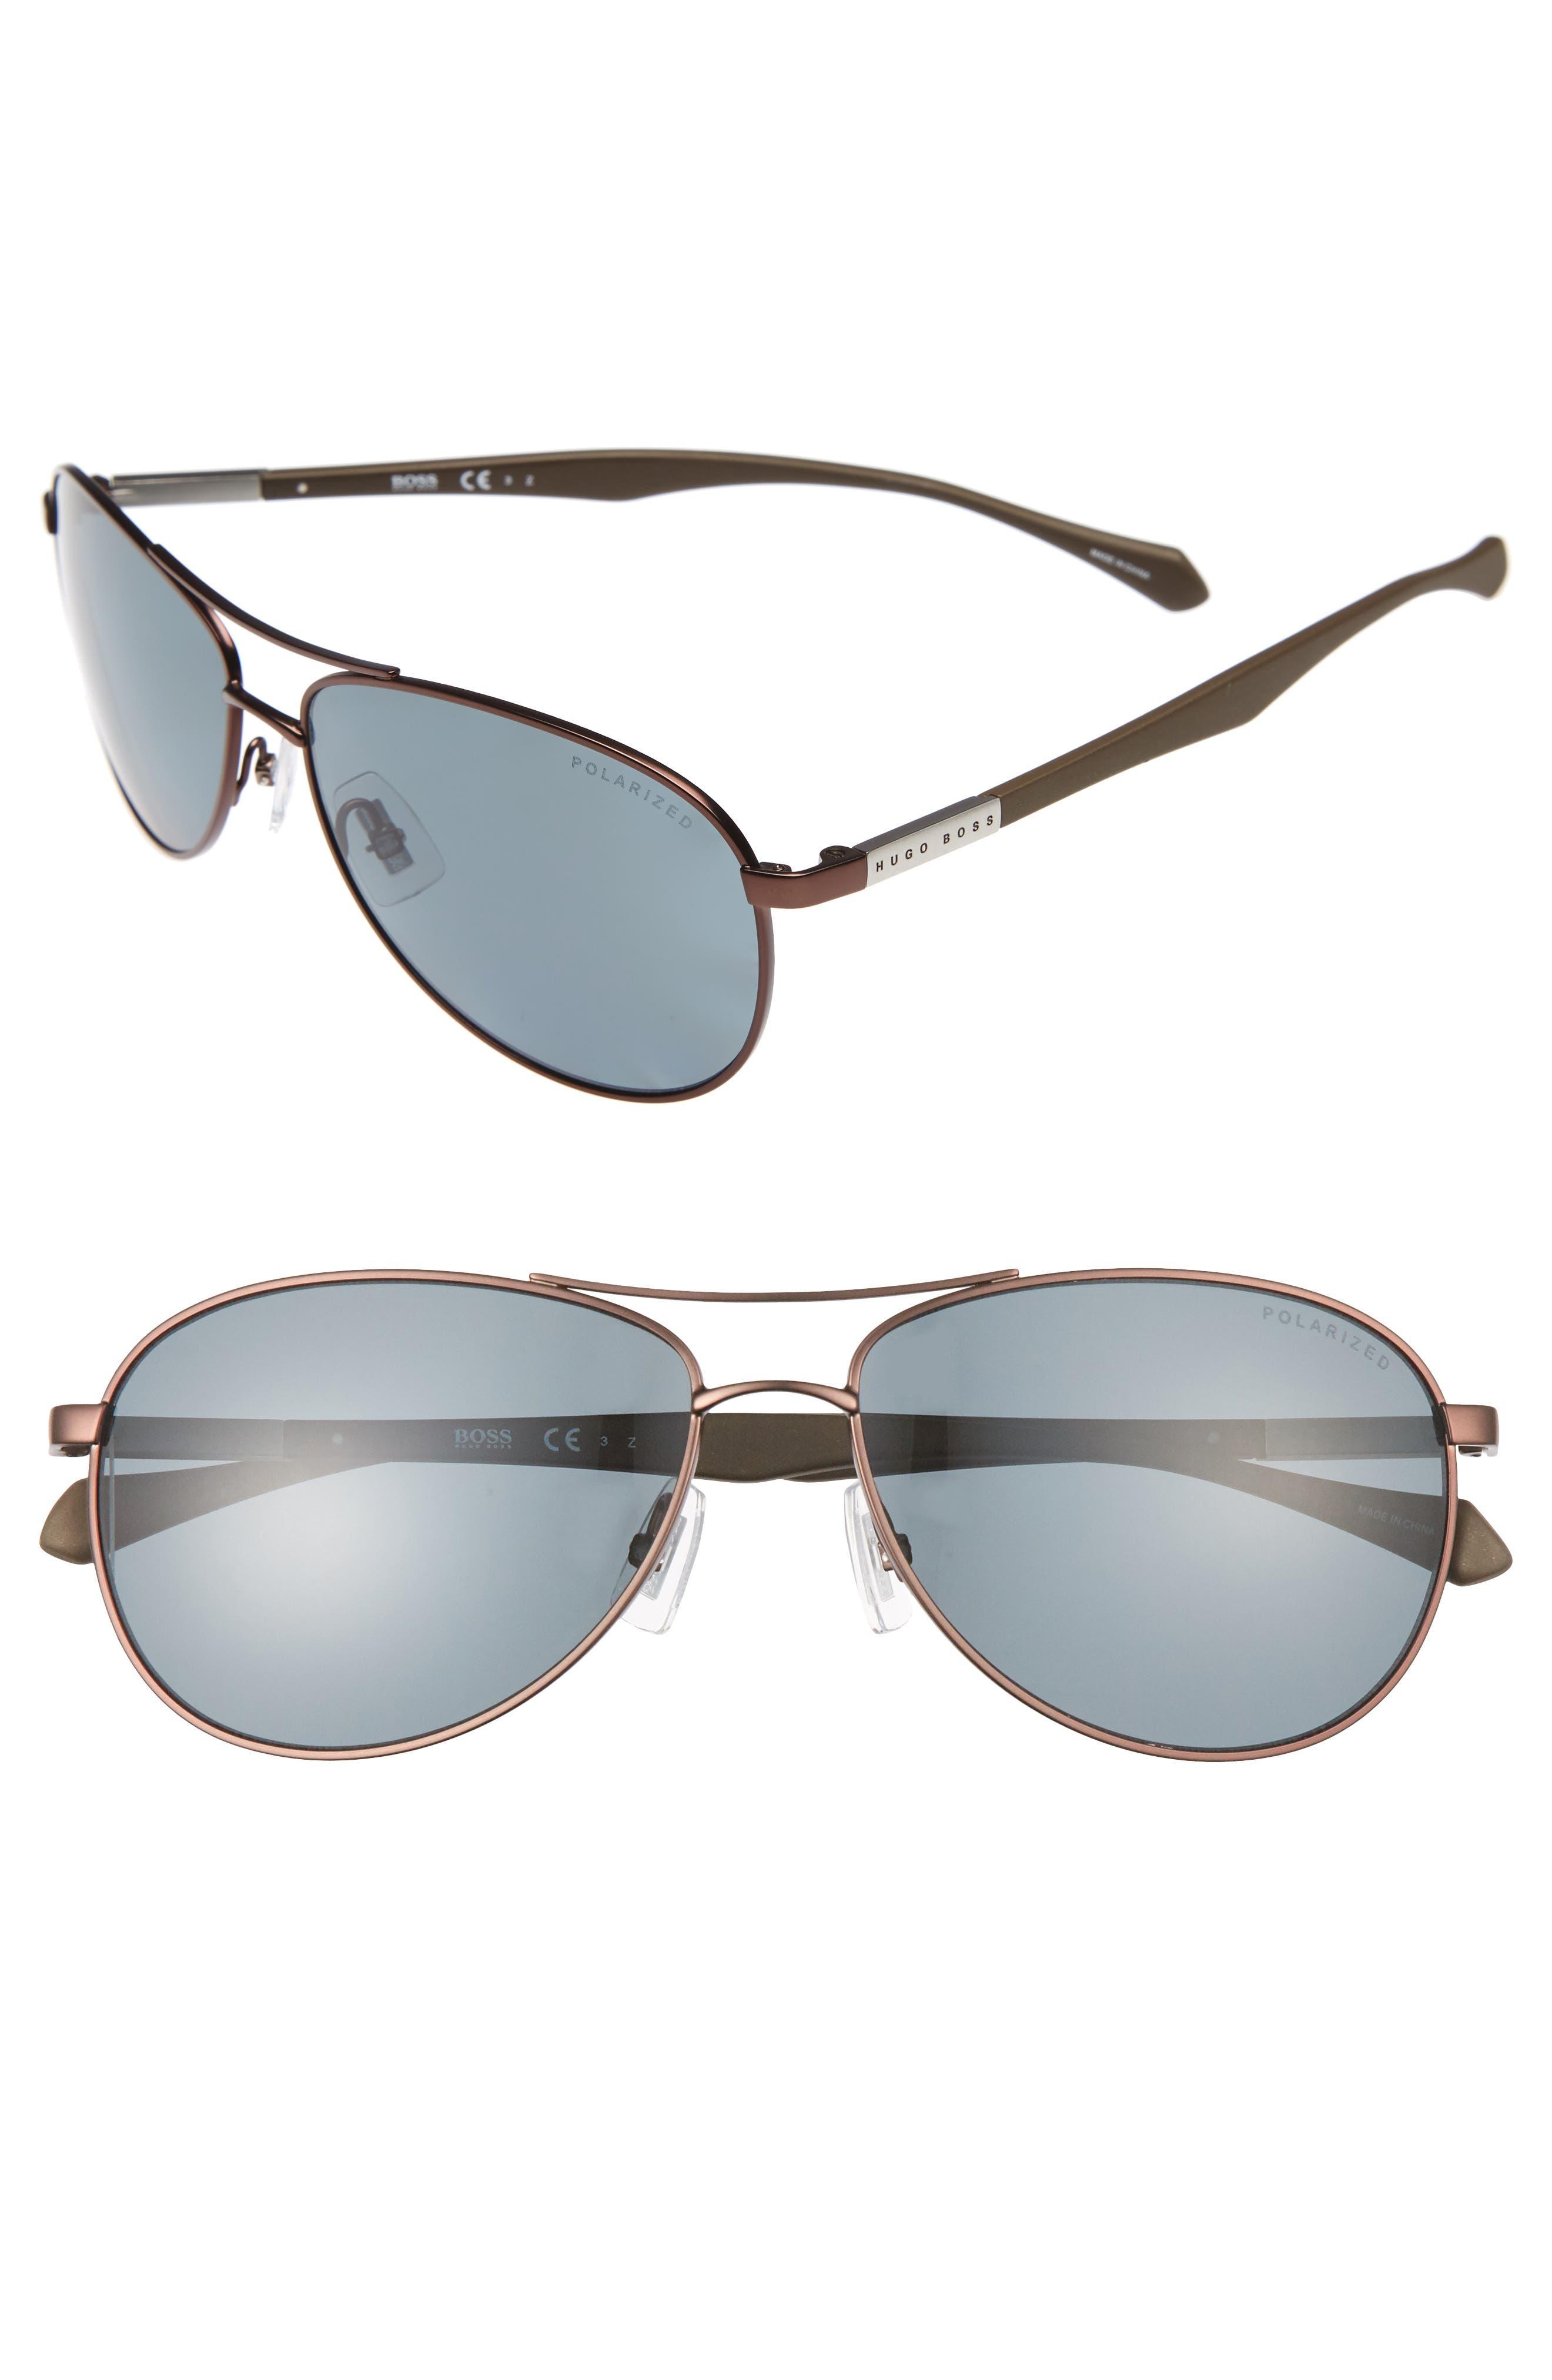 Alternate Image 1 Selected - BOSS Polarized 60mm Sunglasses